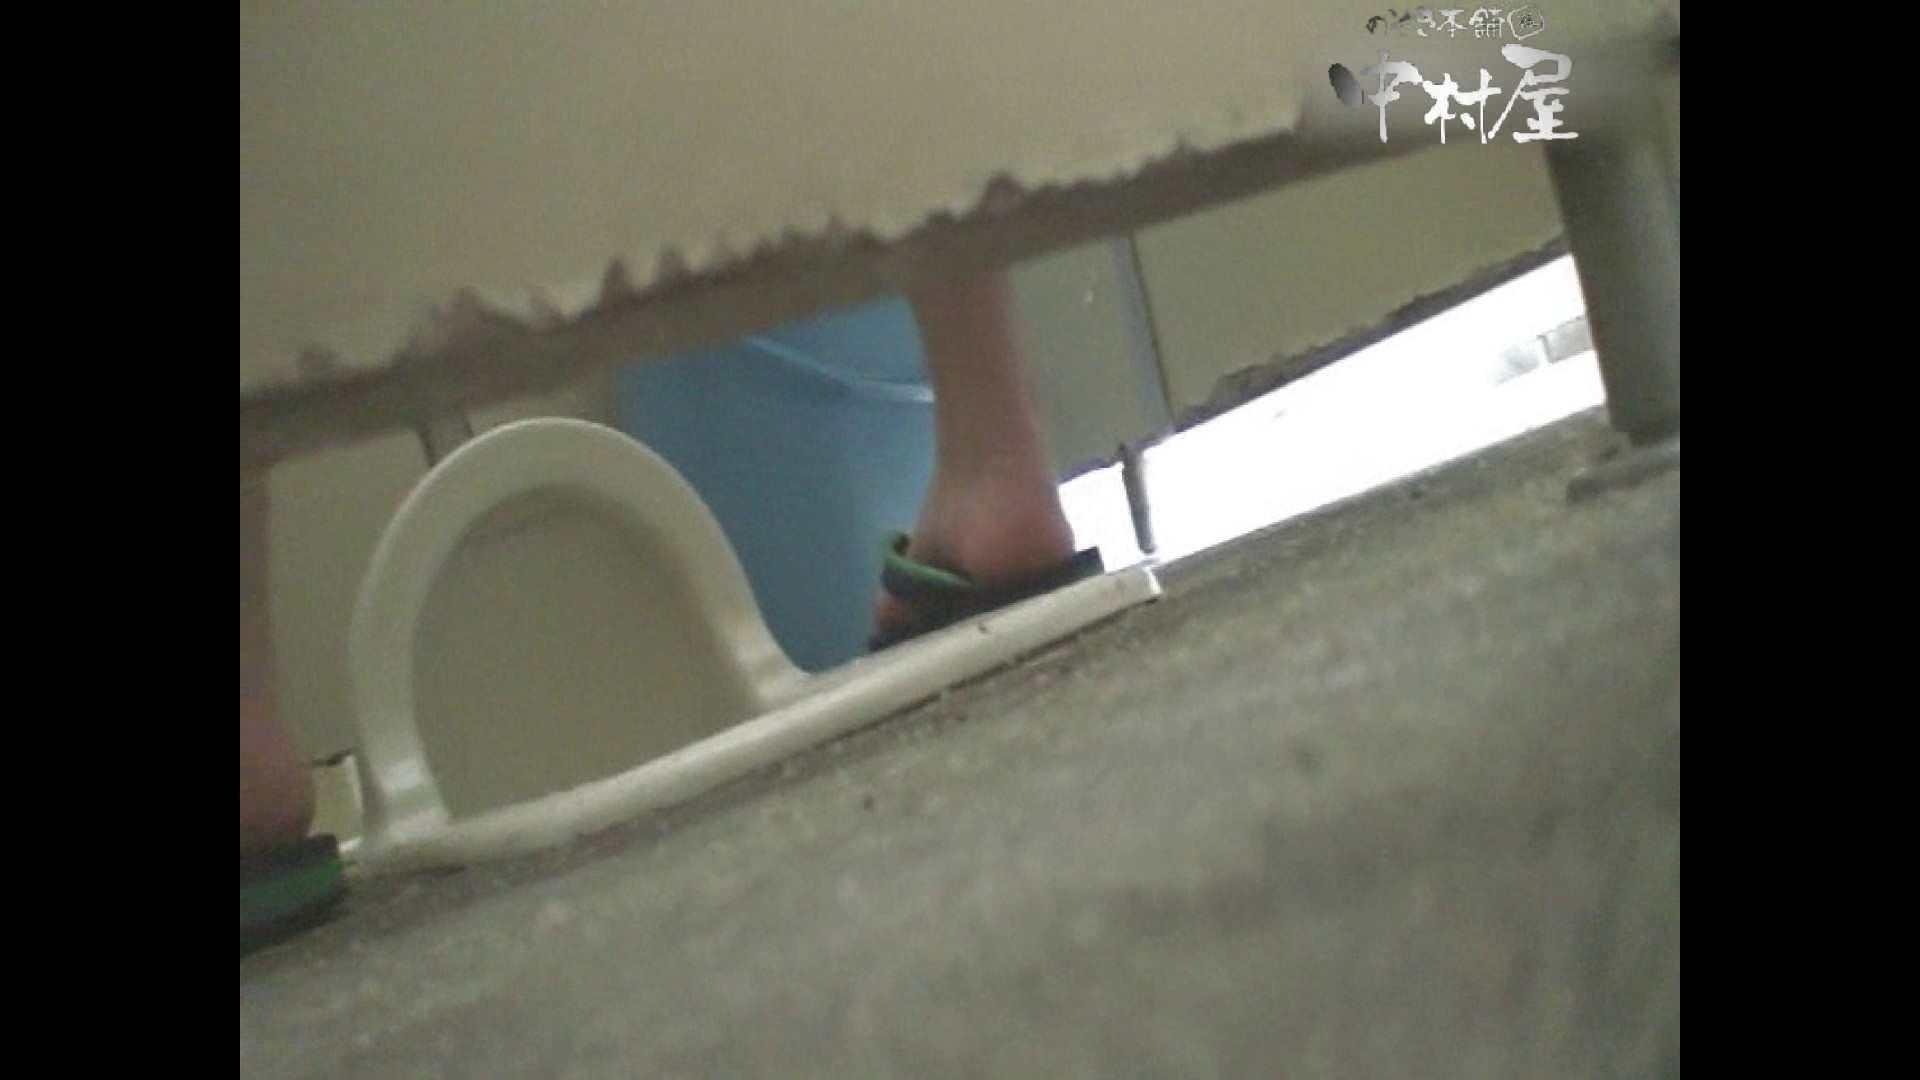 岩手県在住盗撮師盗撮記録vol.14 オマンコ 盗み撮りSEX無修正画像 96連発 9